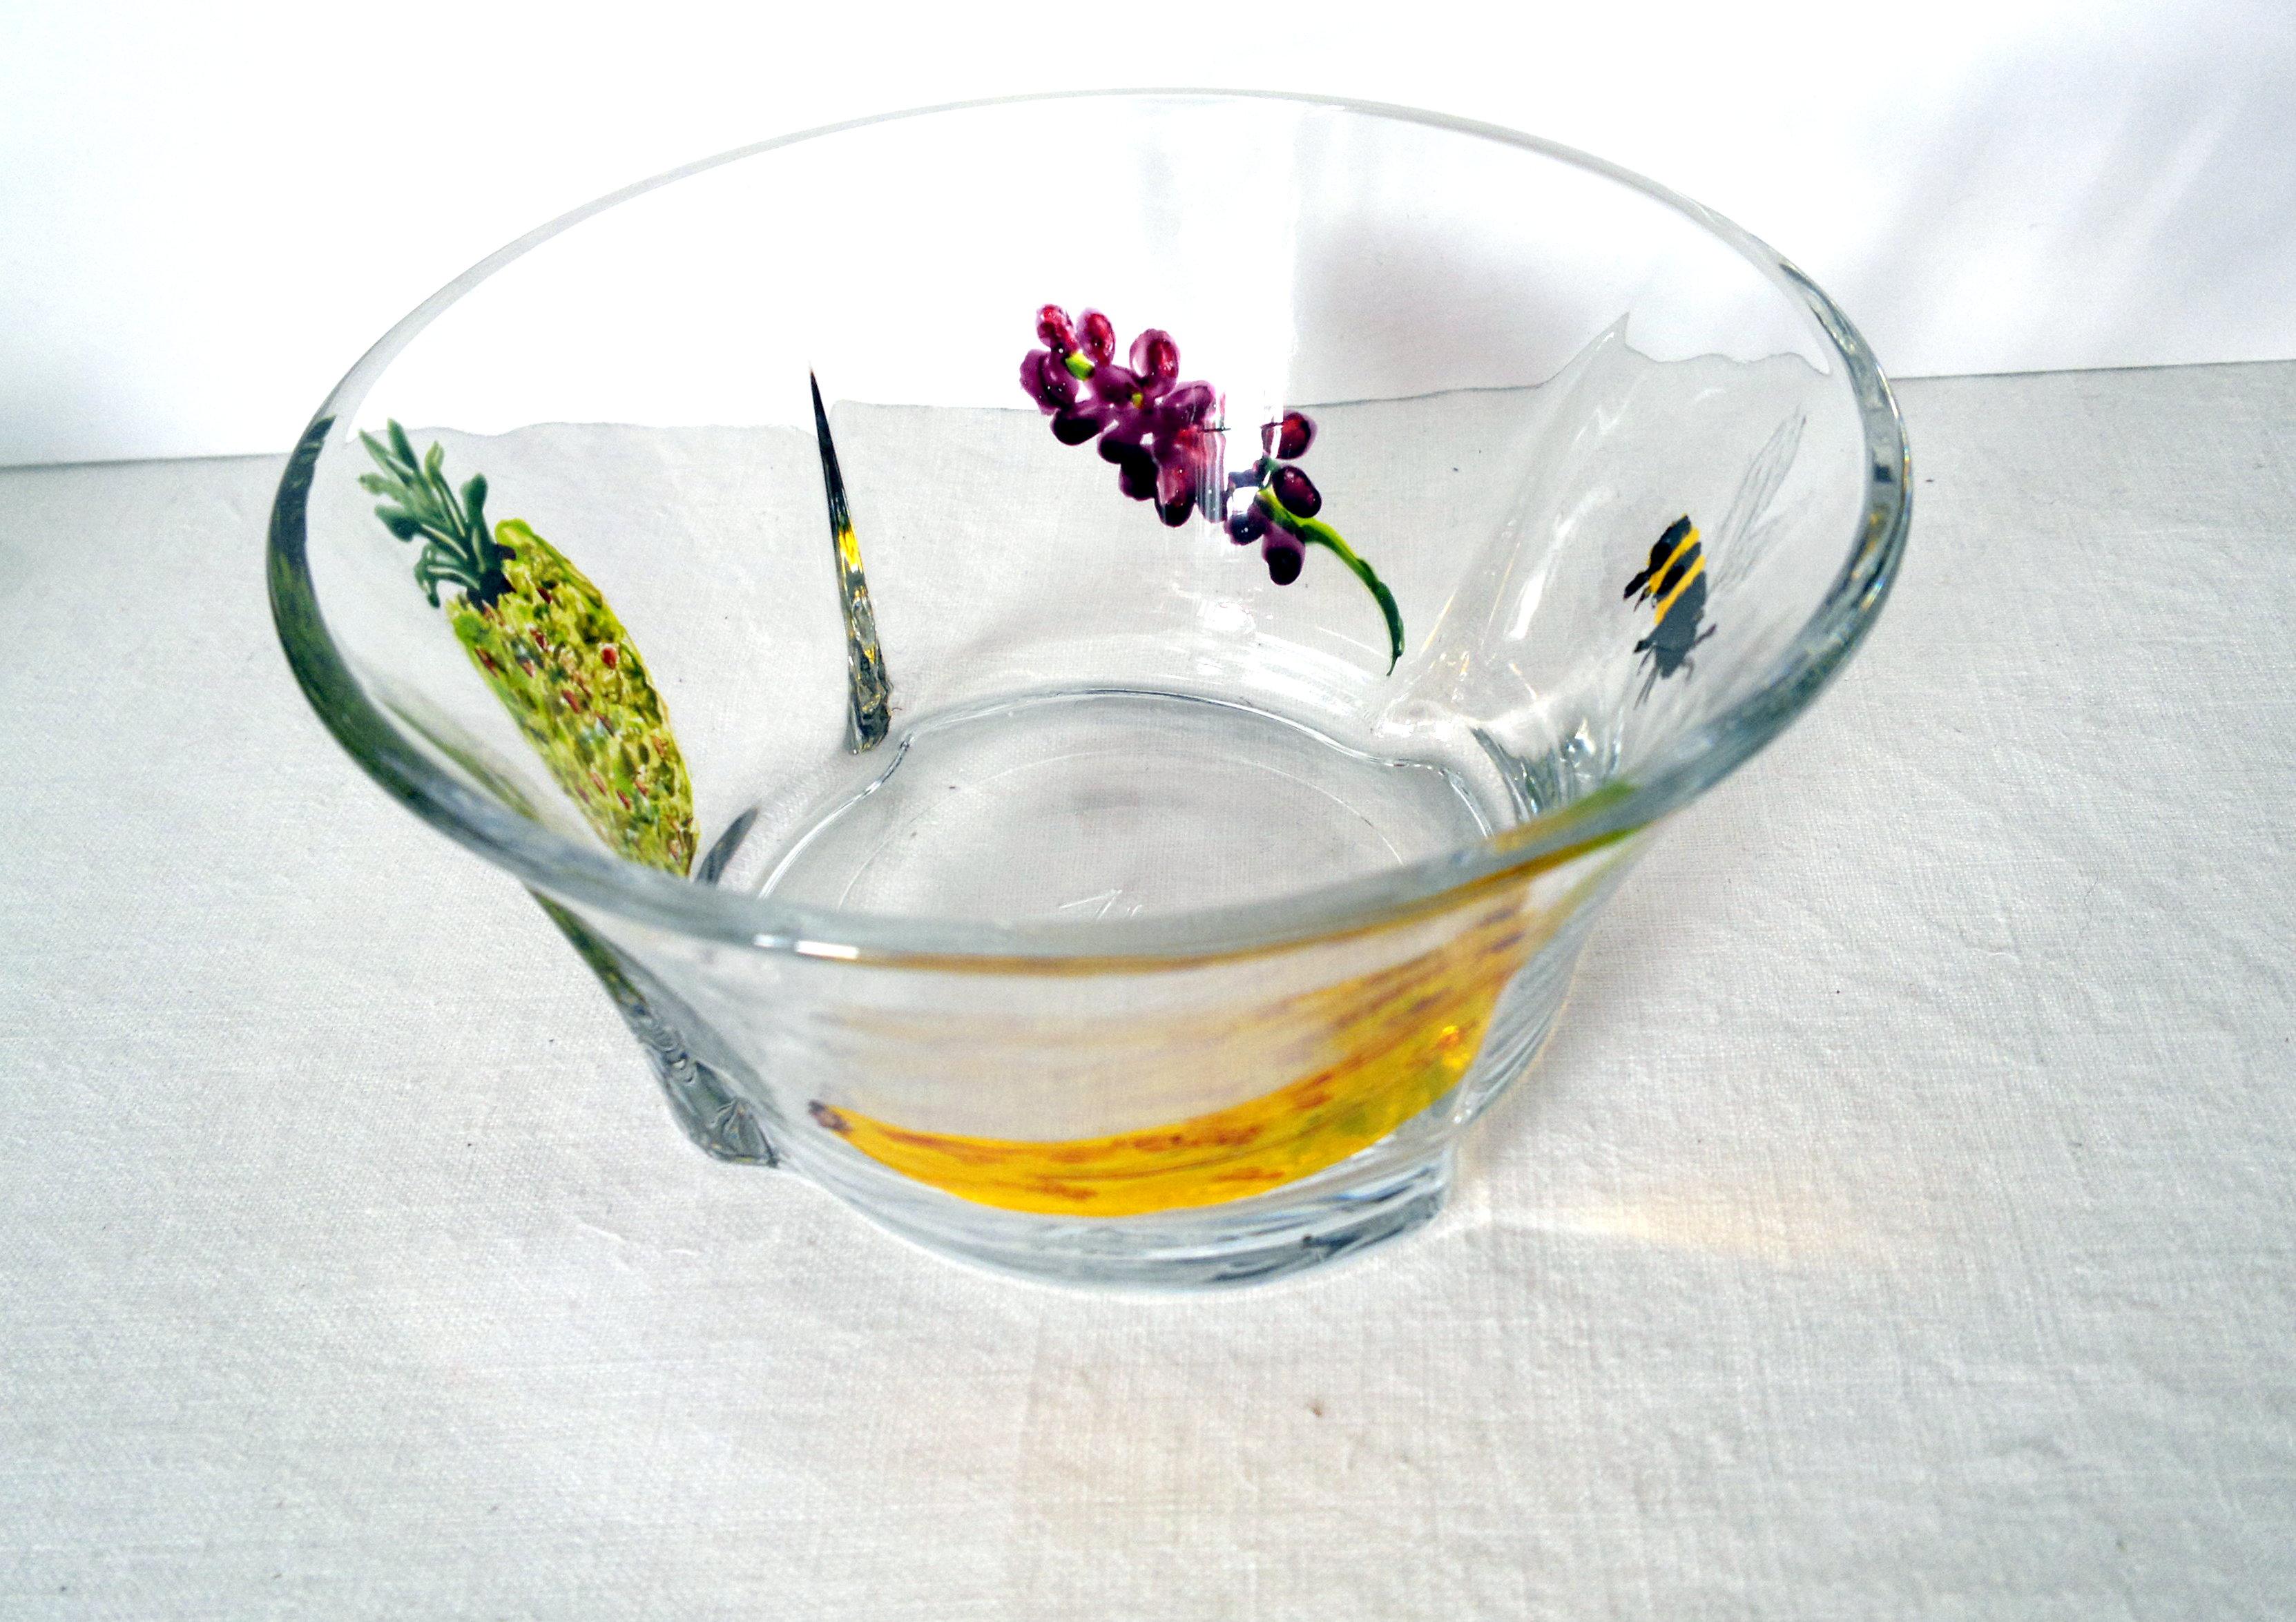 fruit-bee-bowl-sideways